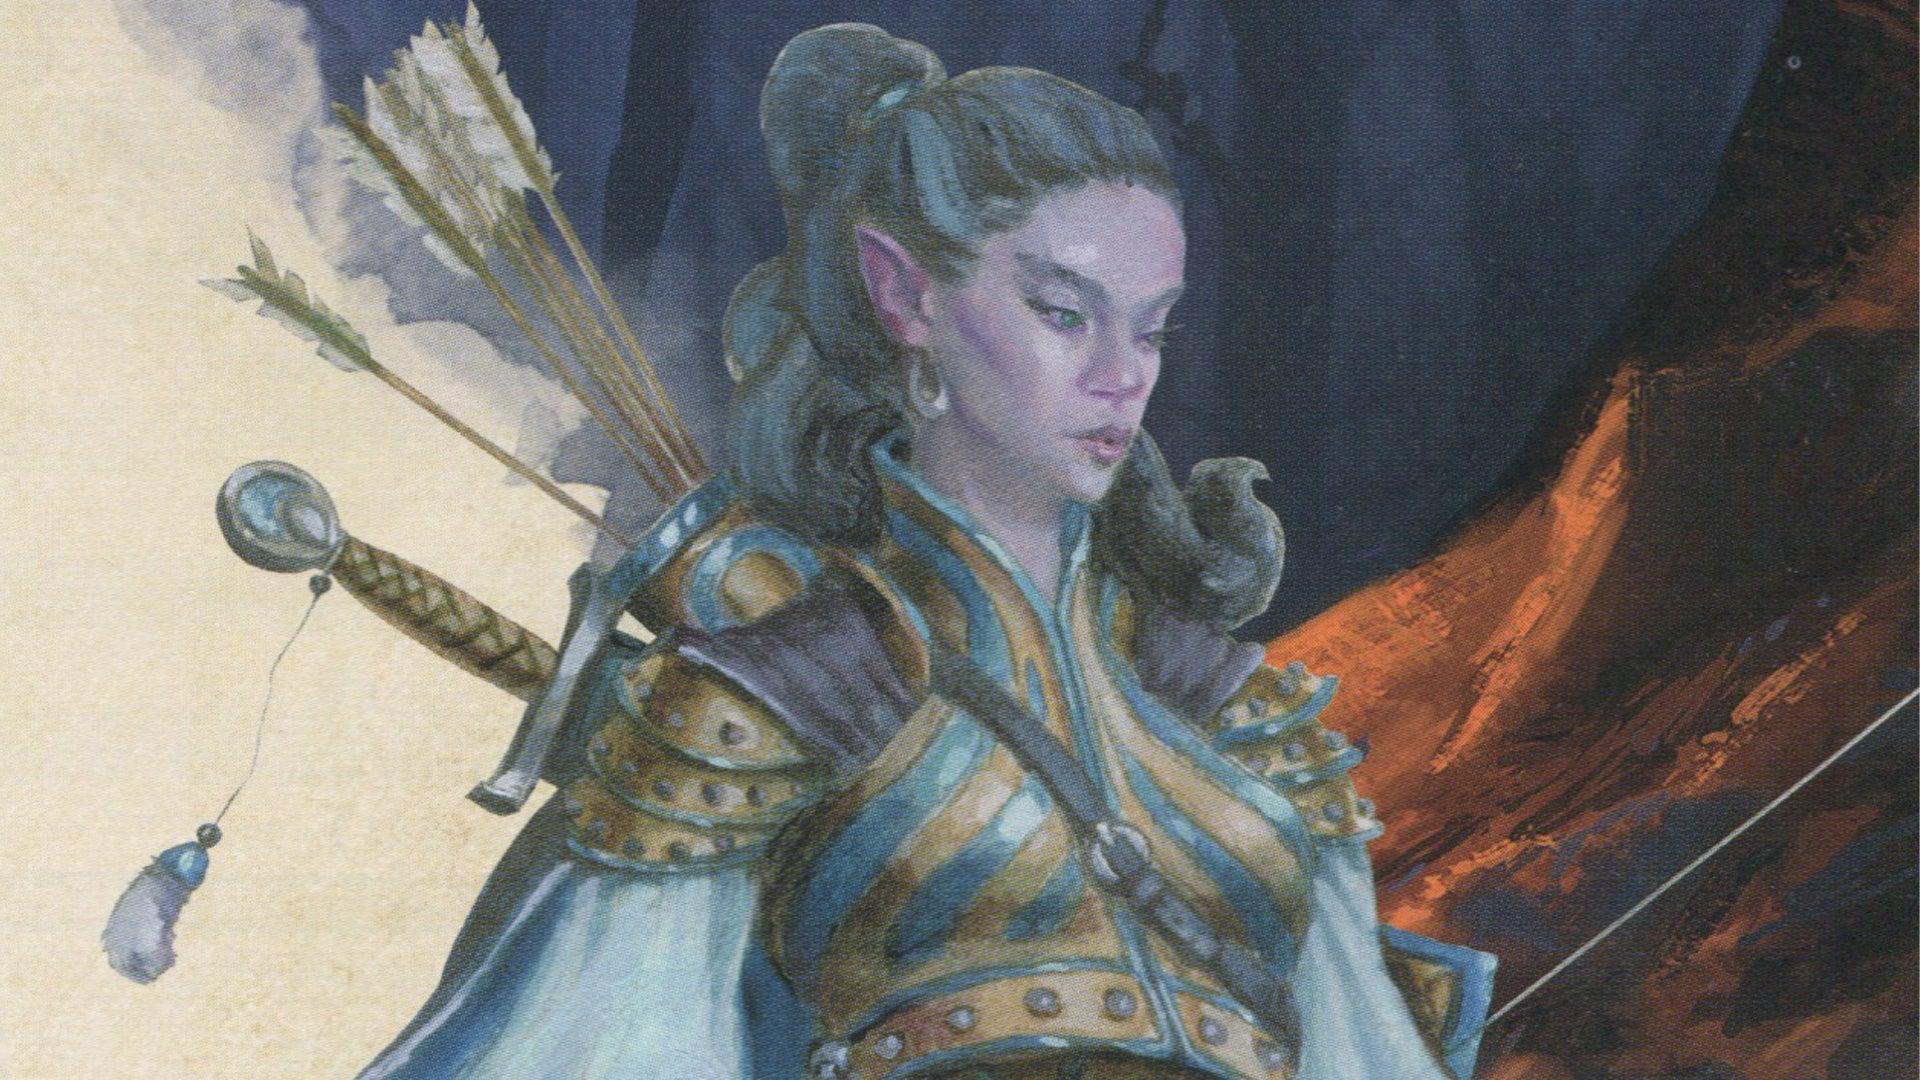 Dungeons and Dragons Player's Handbook artwork 22